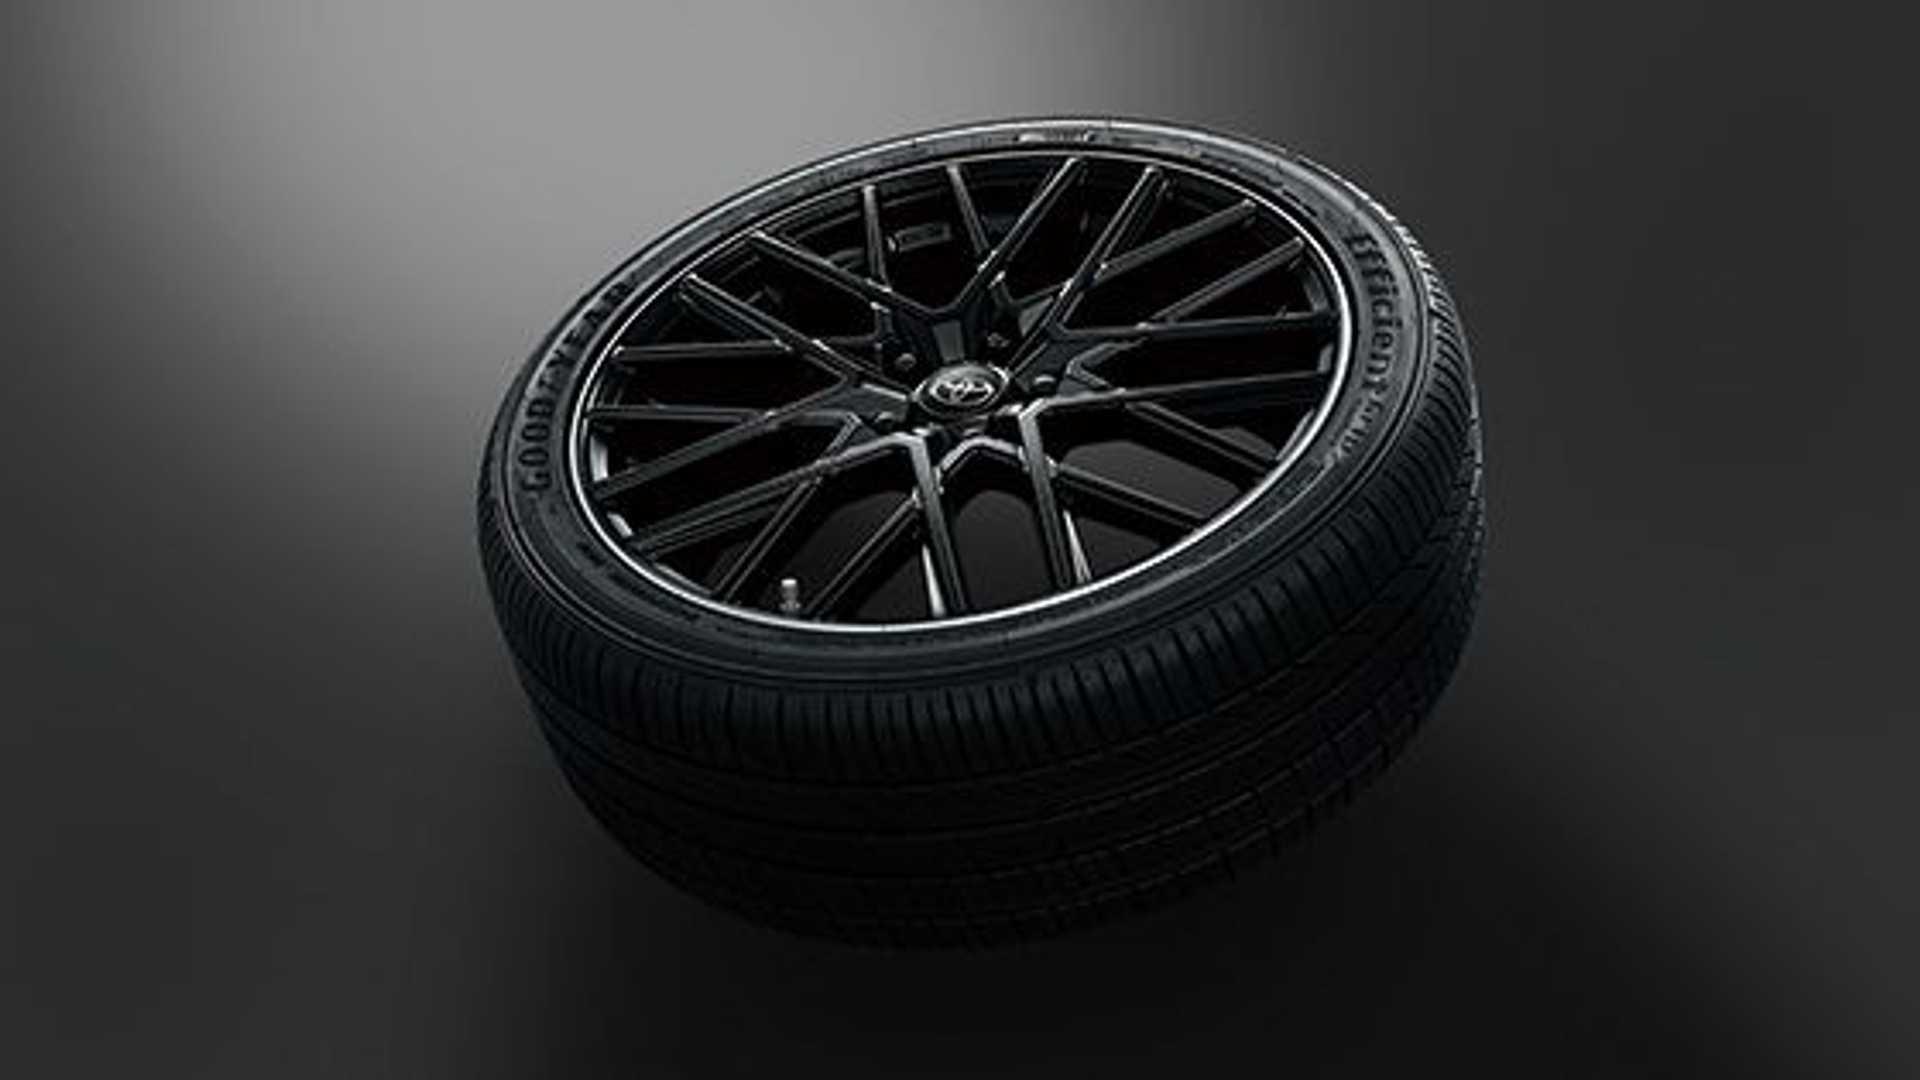 toyota-camry-gr-19-inch-wheel